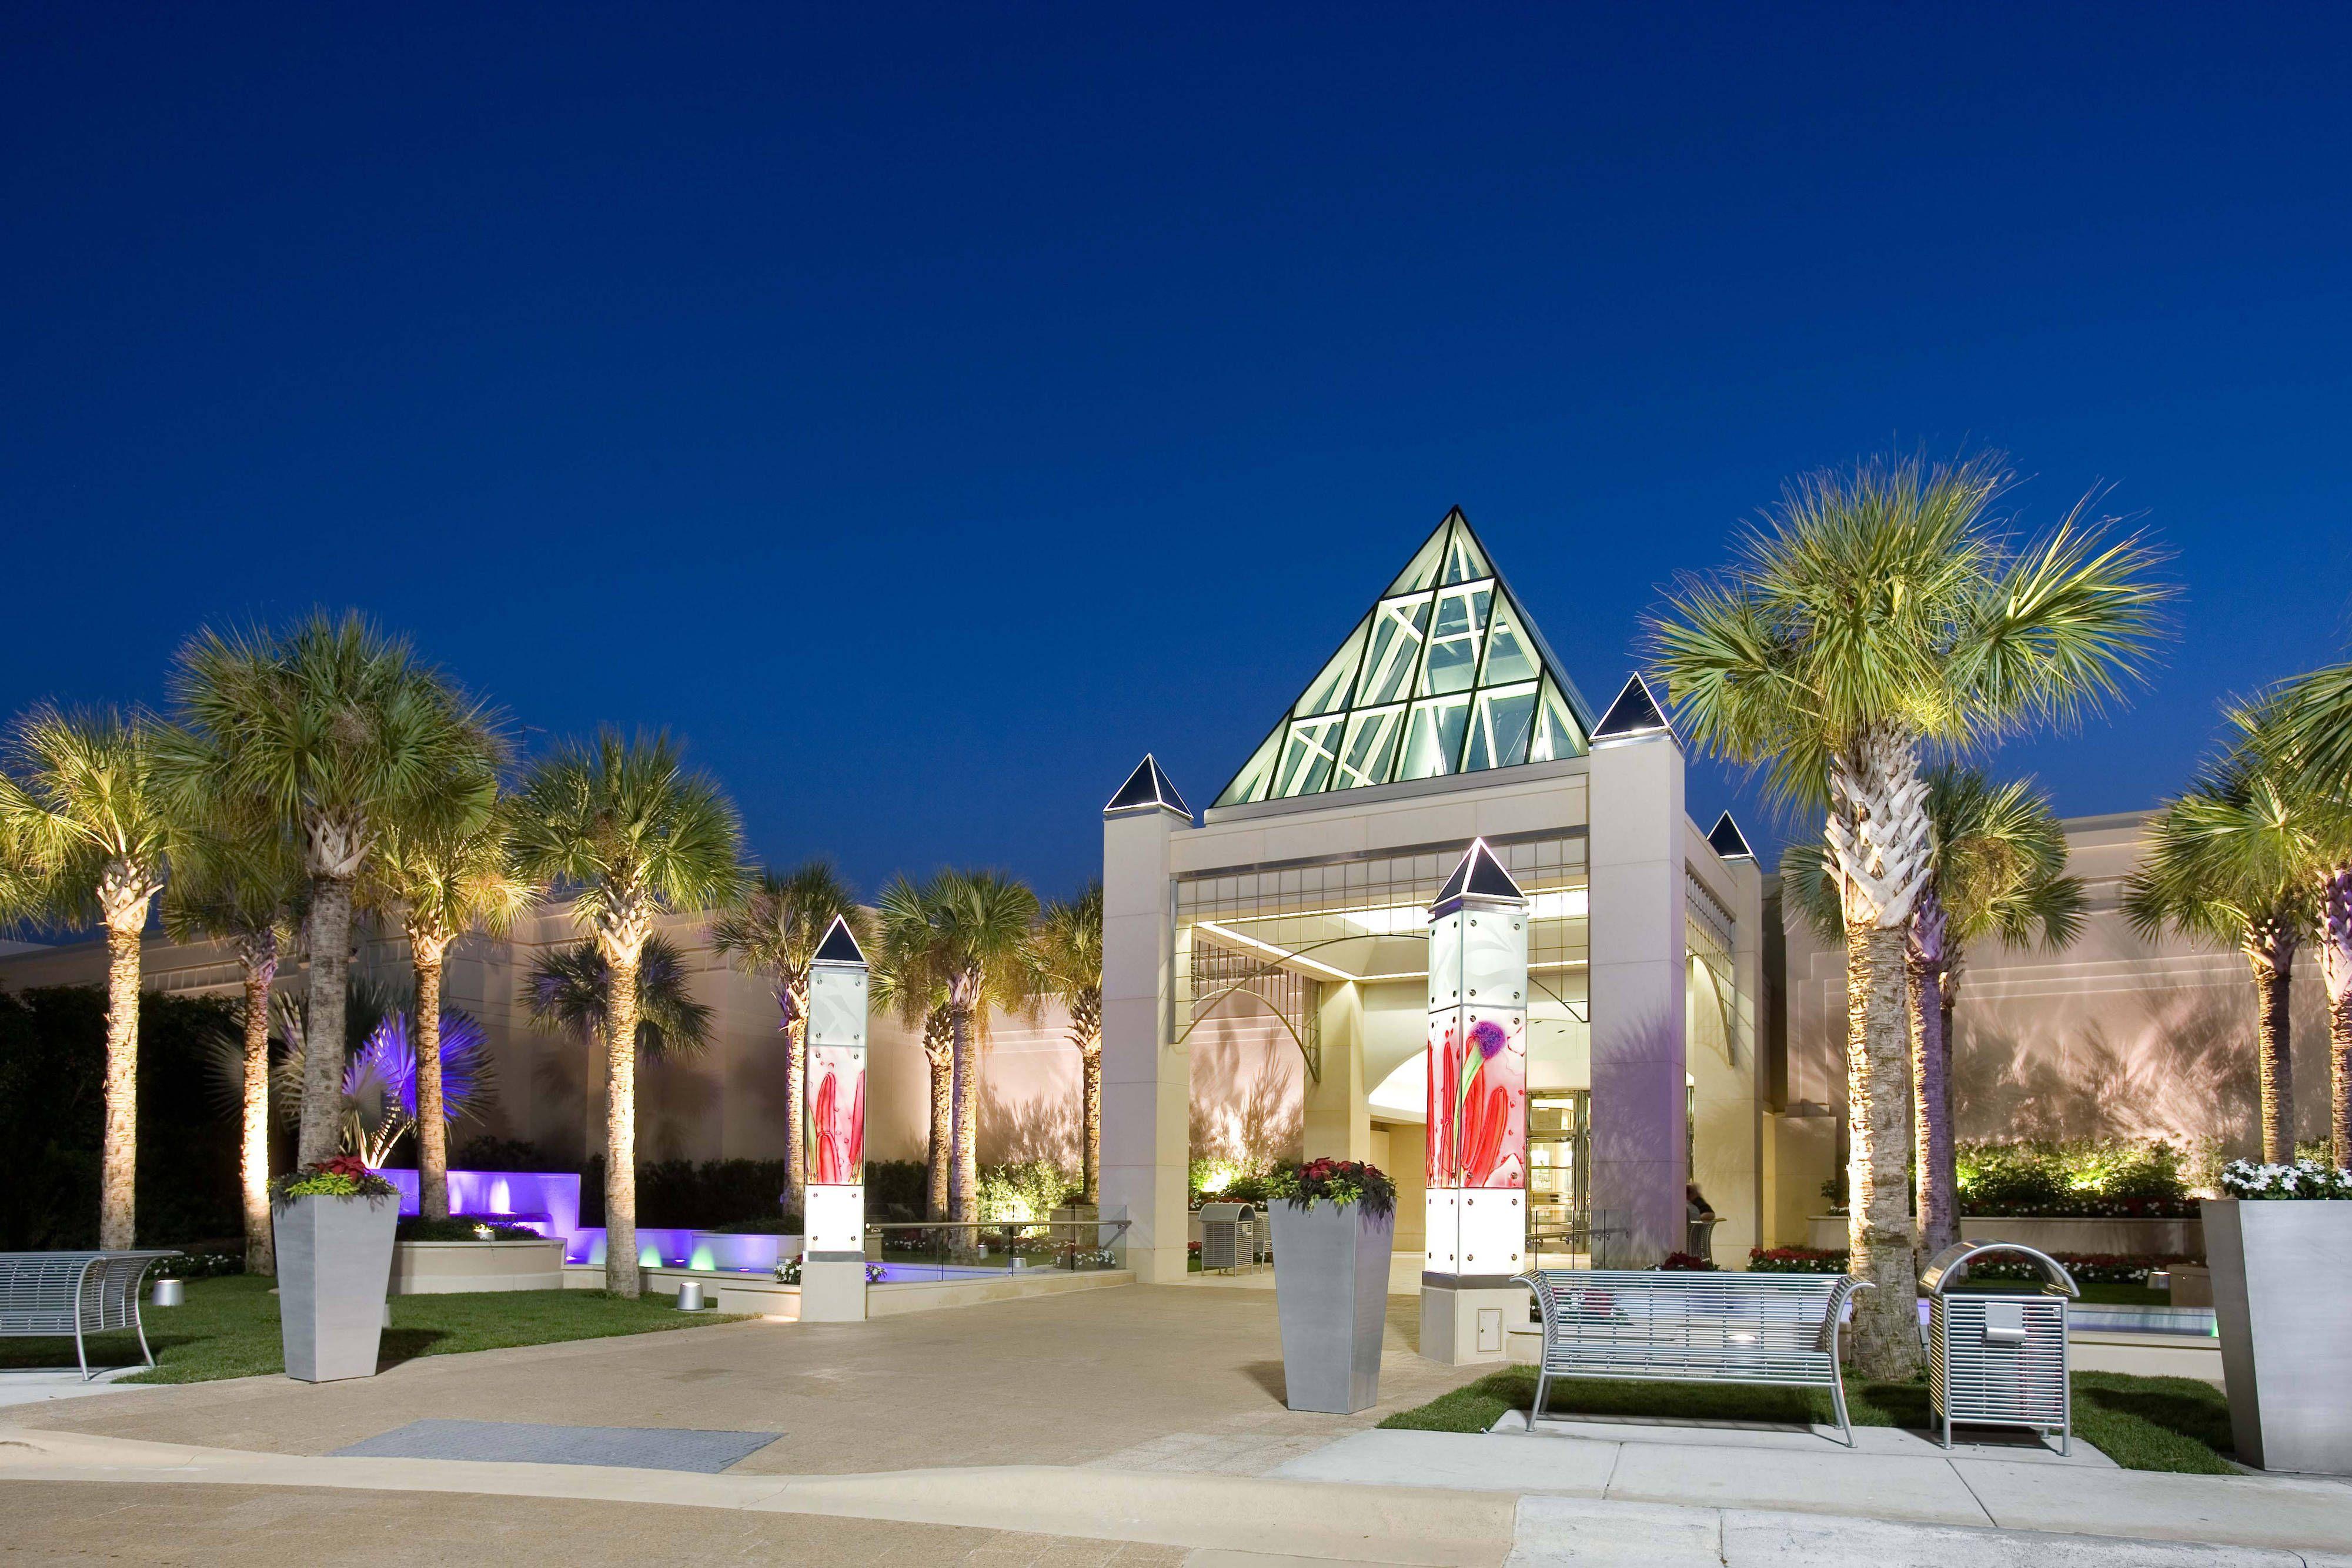 05fa5939710da6c514e887a84b104b53 - Homewood Suites By Hilton Palm Beach Gardens Fl